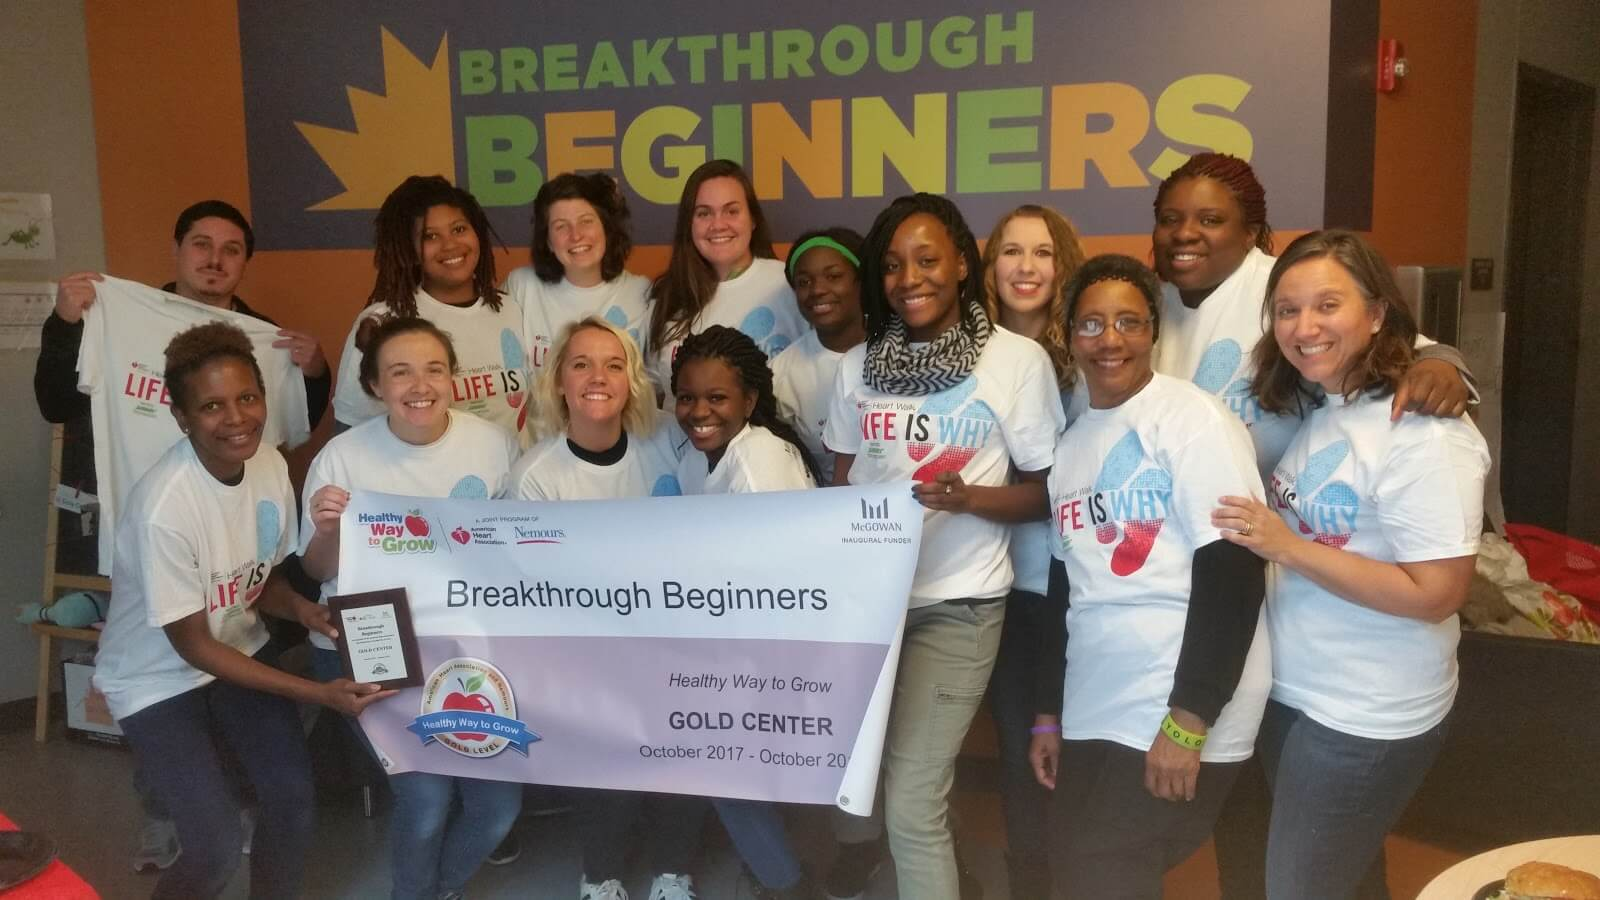 group of teachers posing with Gold certification banner for Breakthrough Beginners preschool